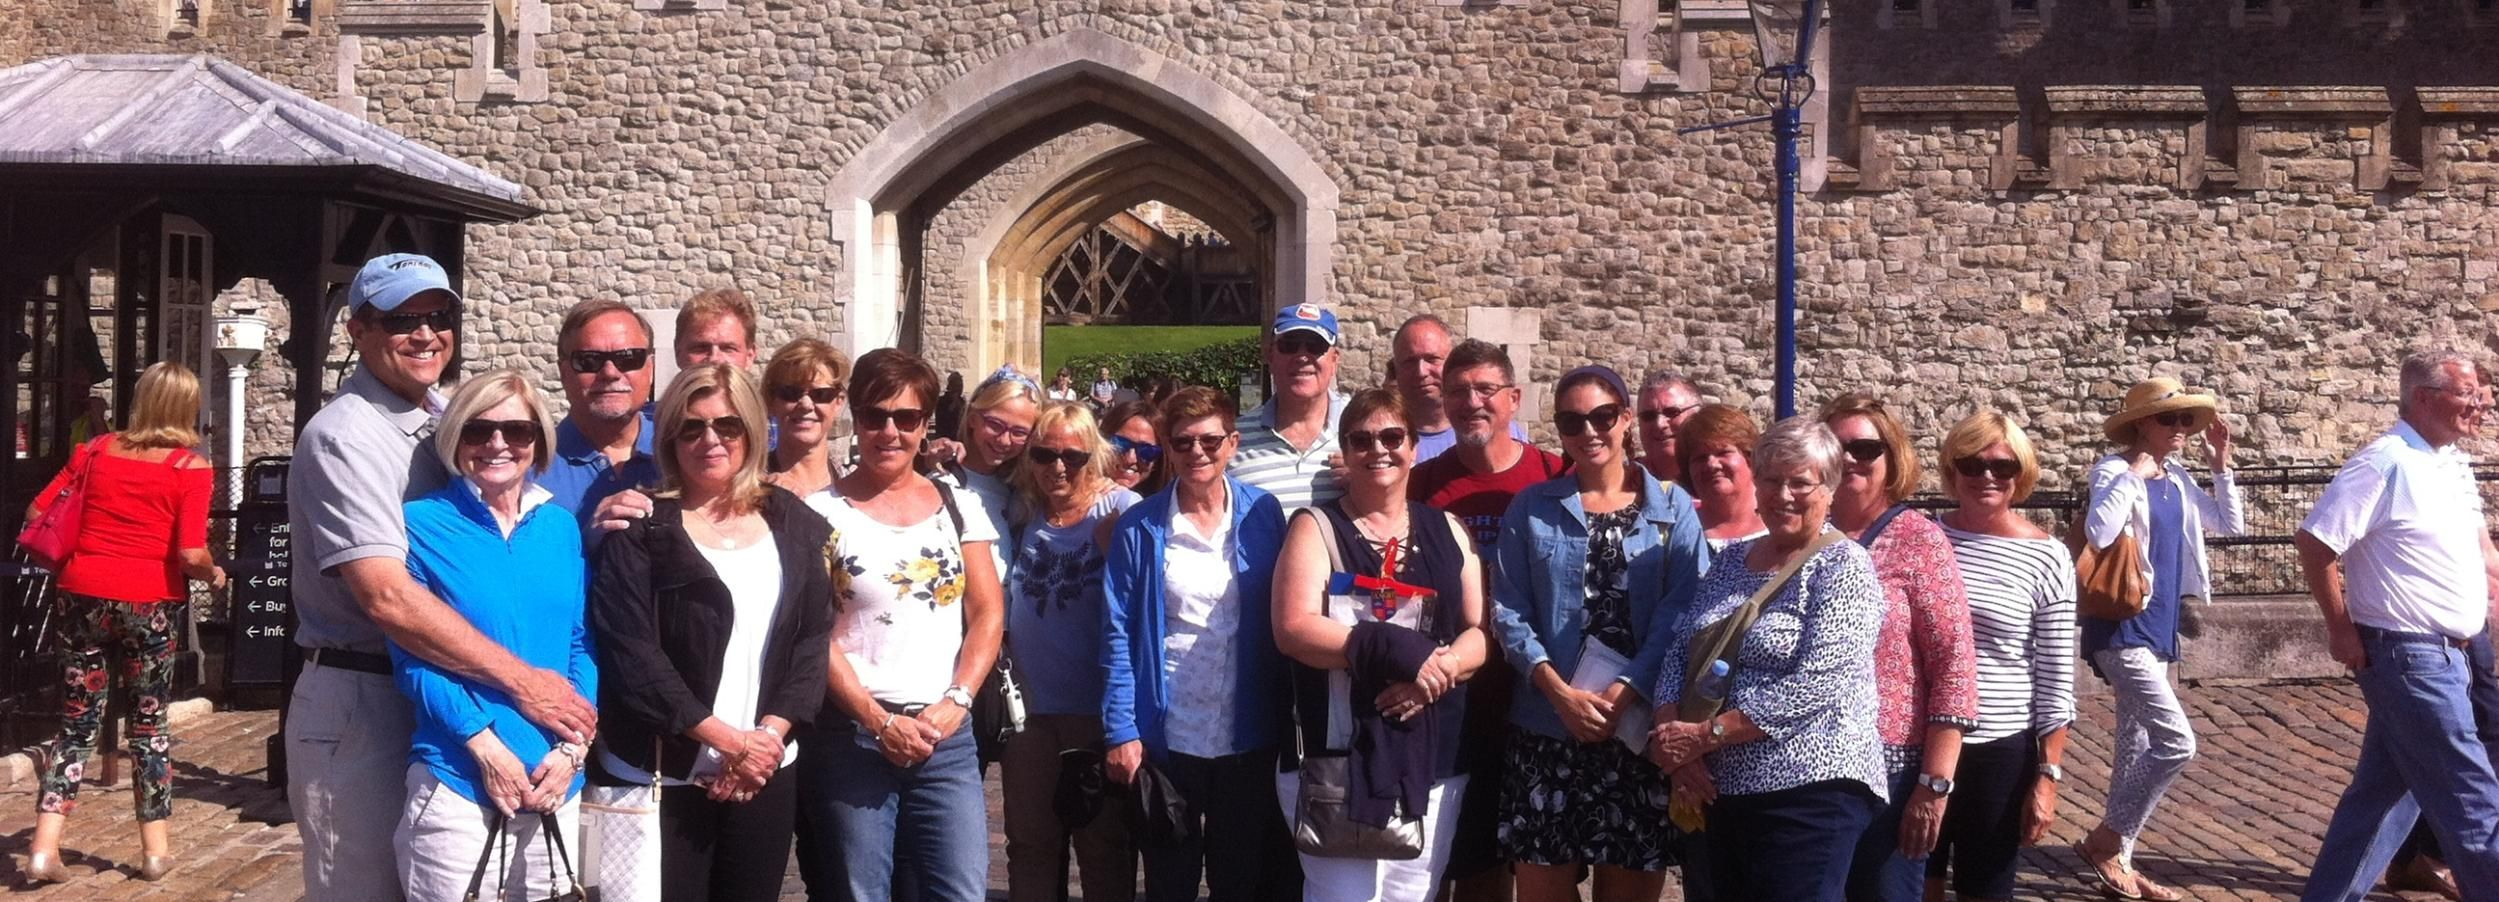 London: Einlass zum Tower of London & Themse-Rundgang